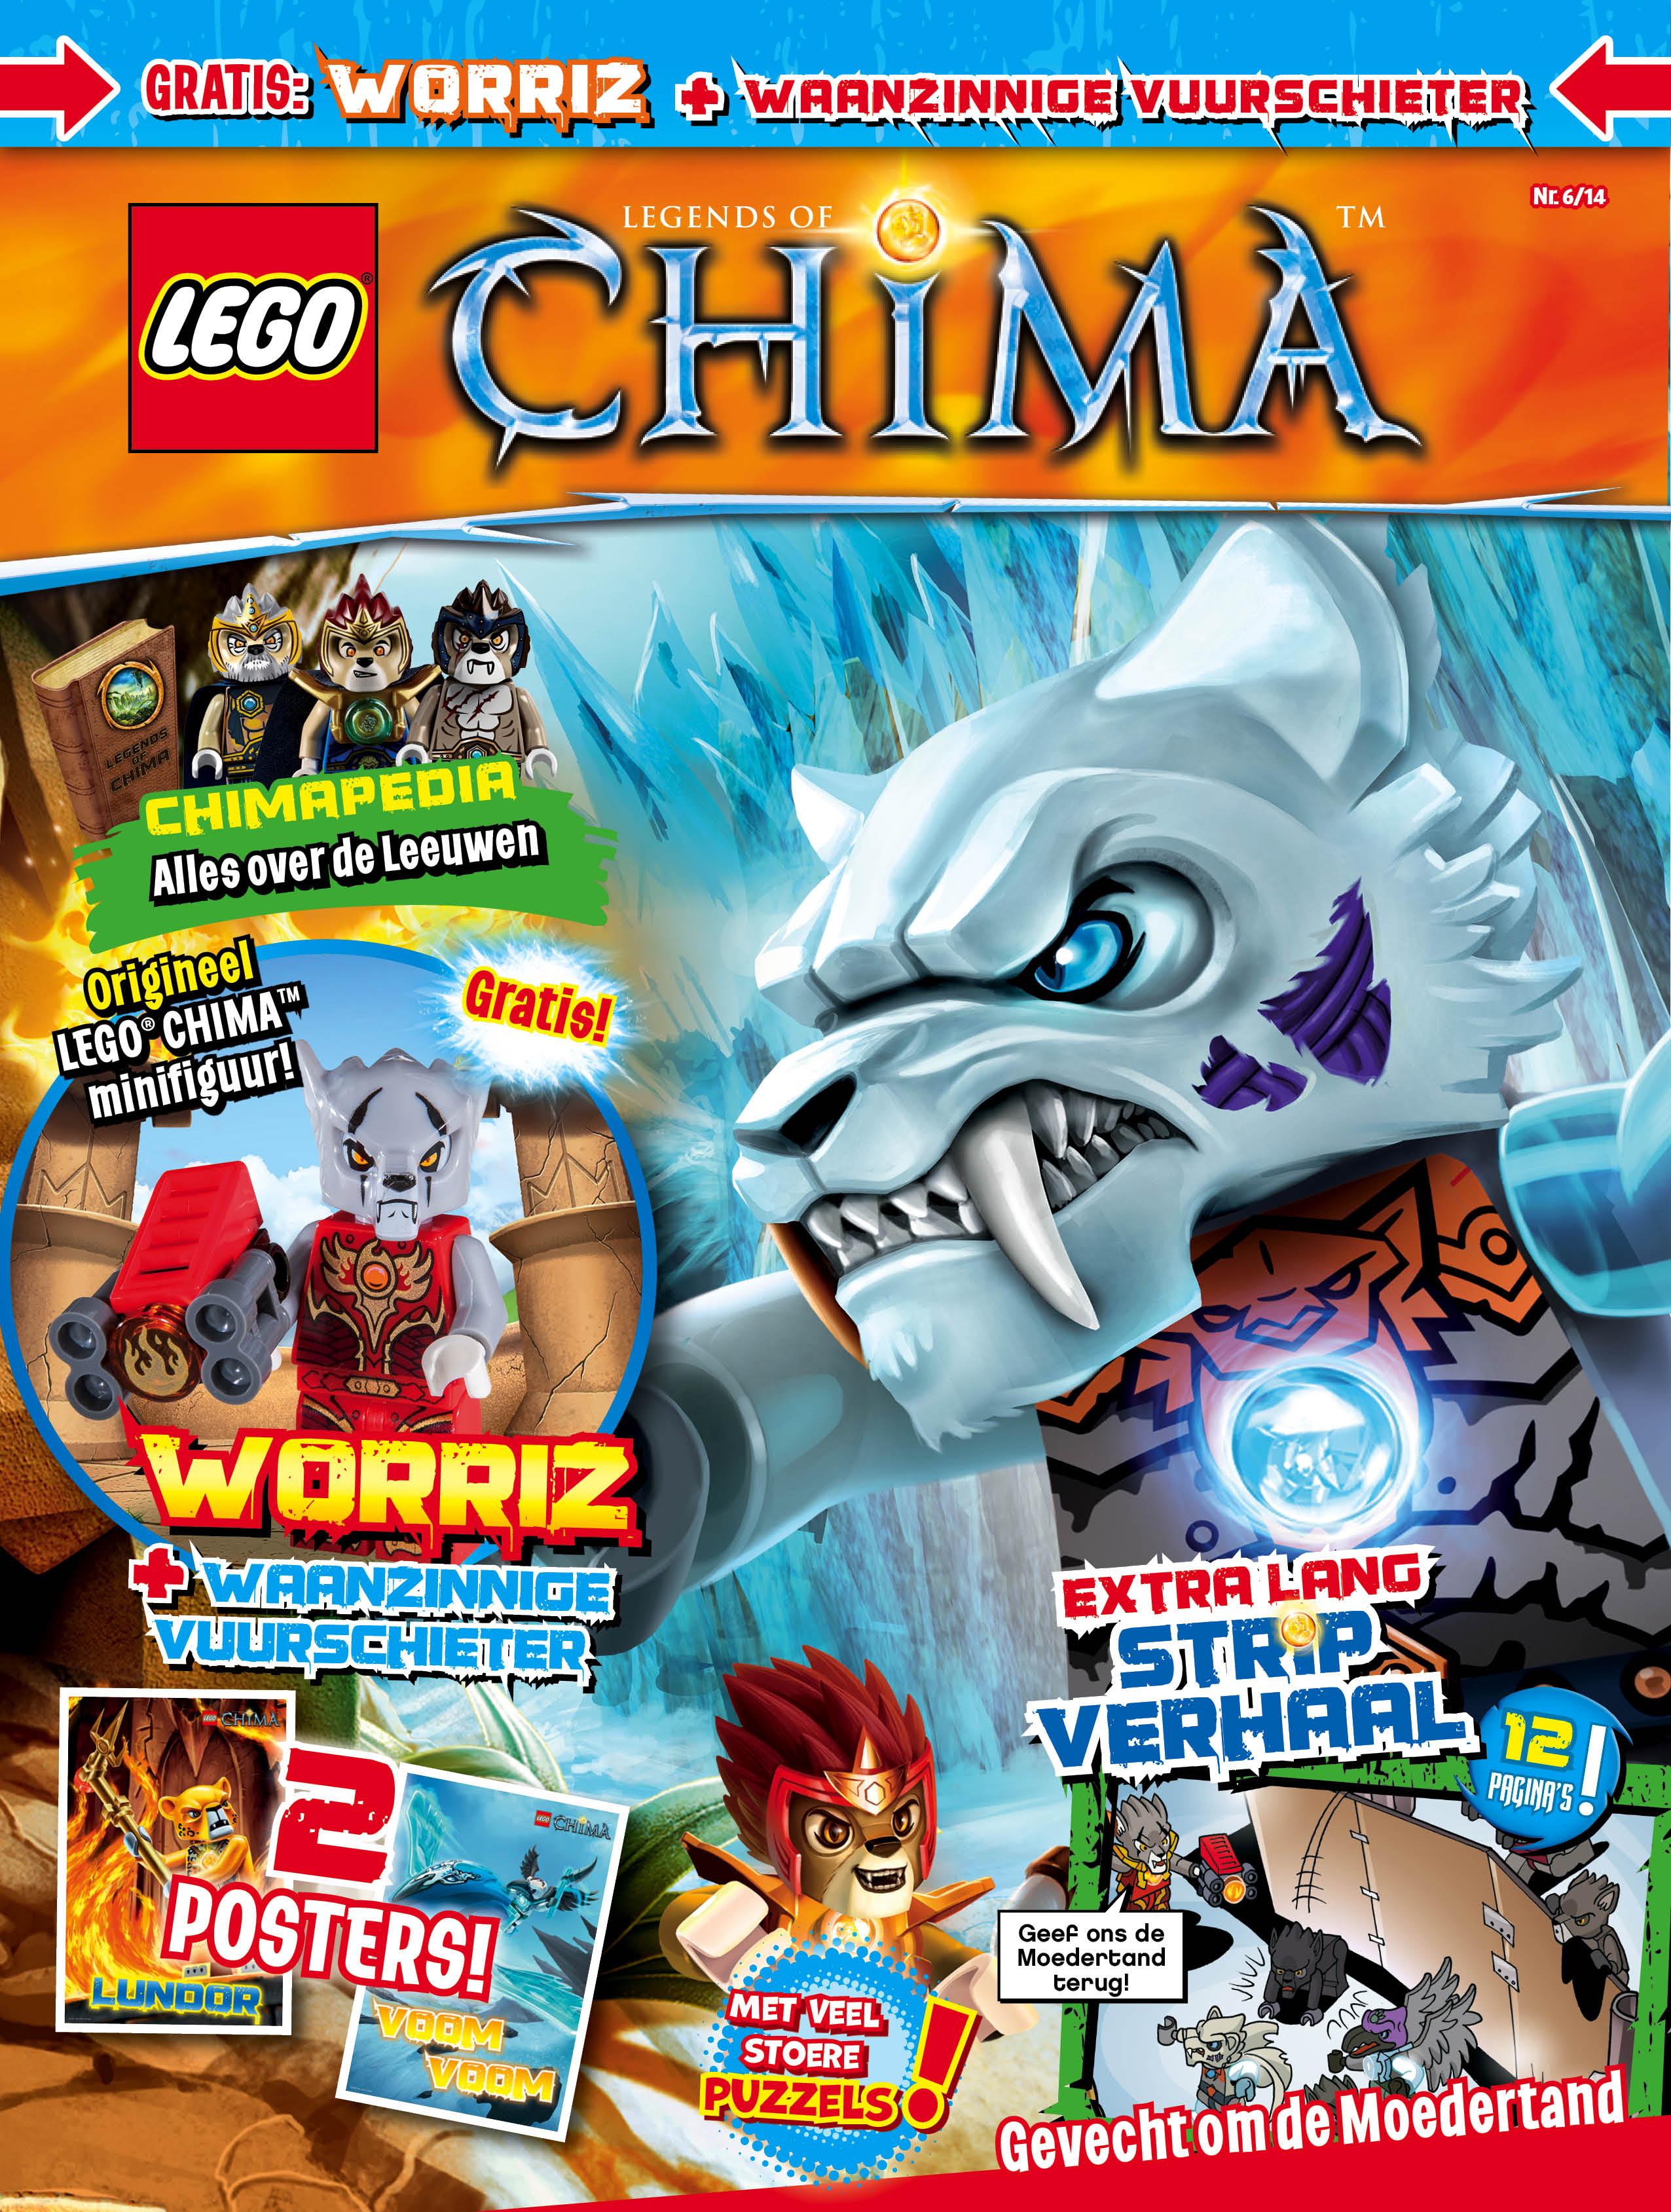 Lego Chima Vornon Lego Chima Magazine b o